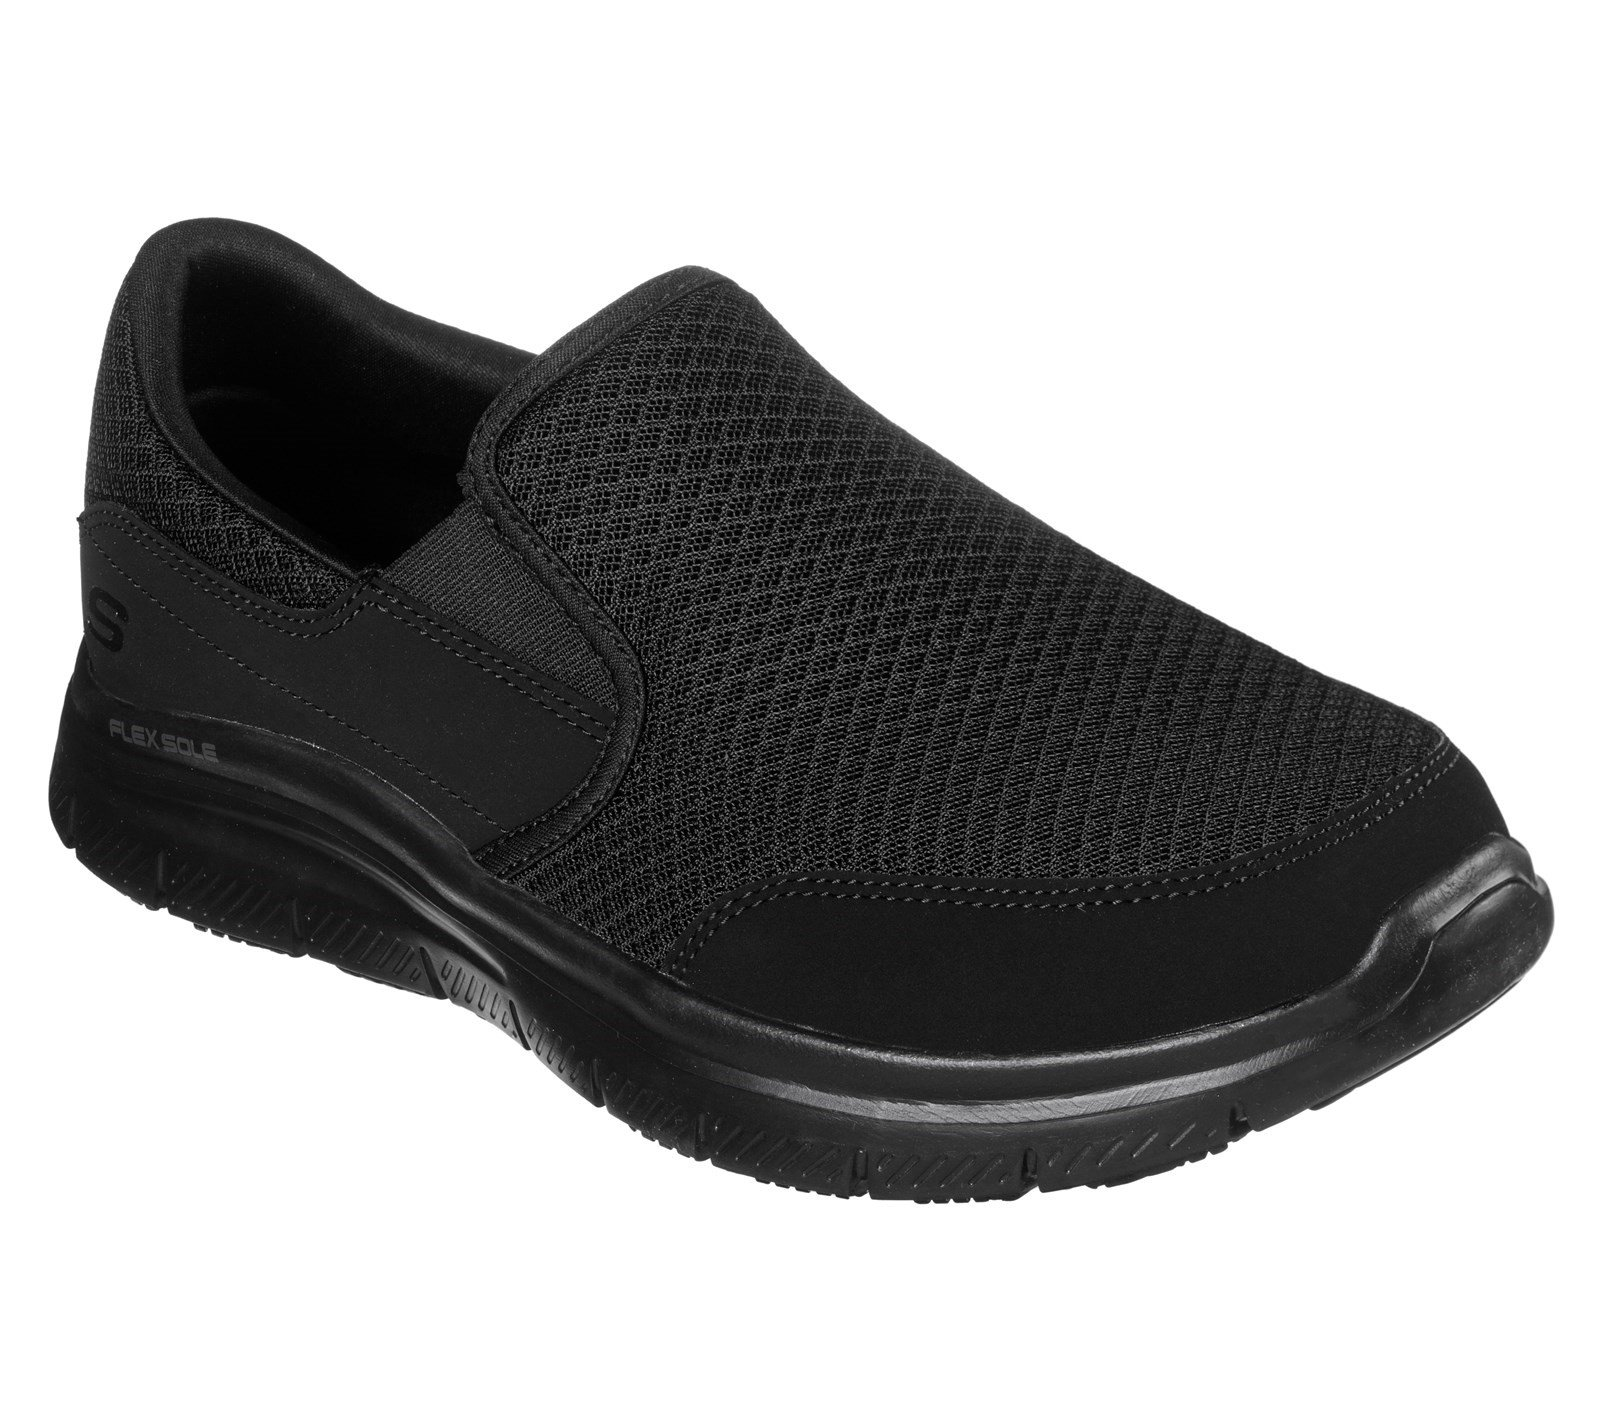 Skechers Unisex McAllen Wide Slip Trainer Black 32945 - Black 6